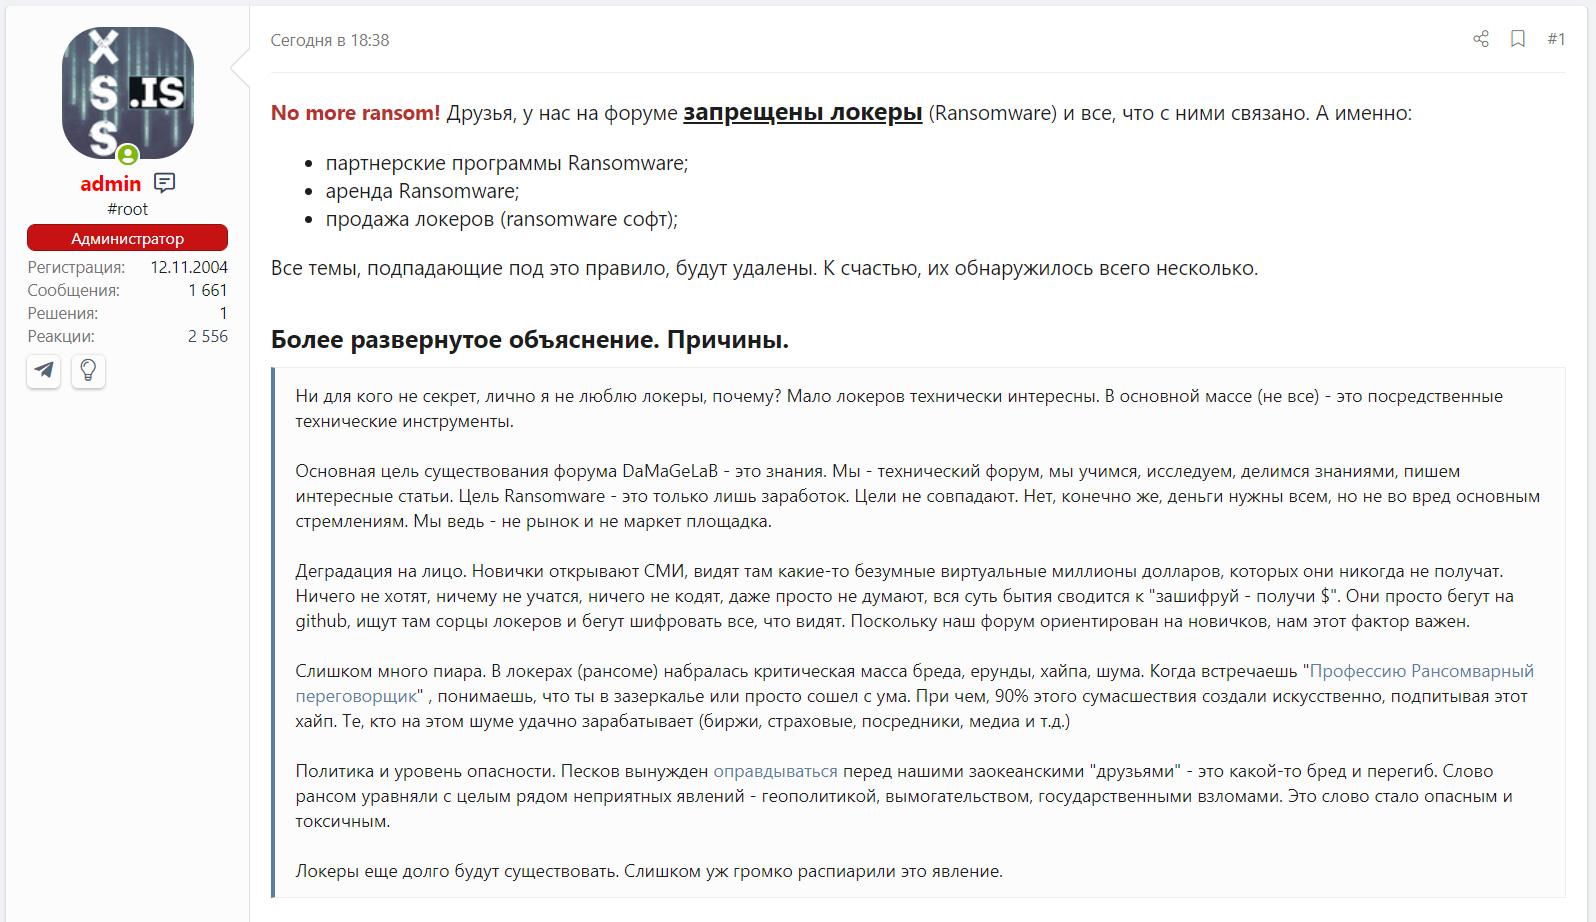 Forum post banning ransomware topics